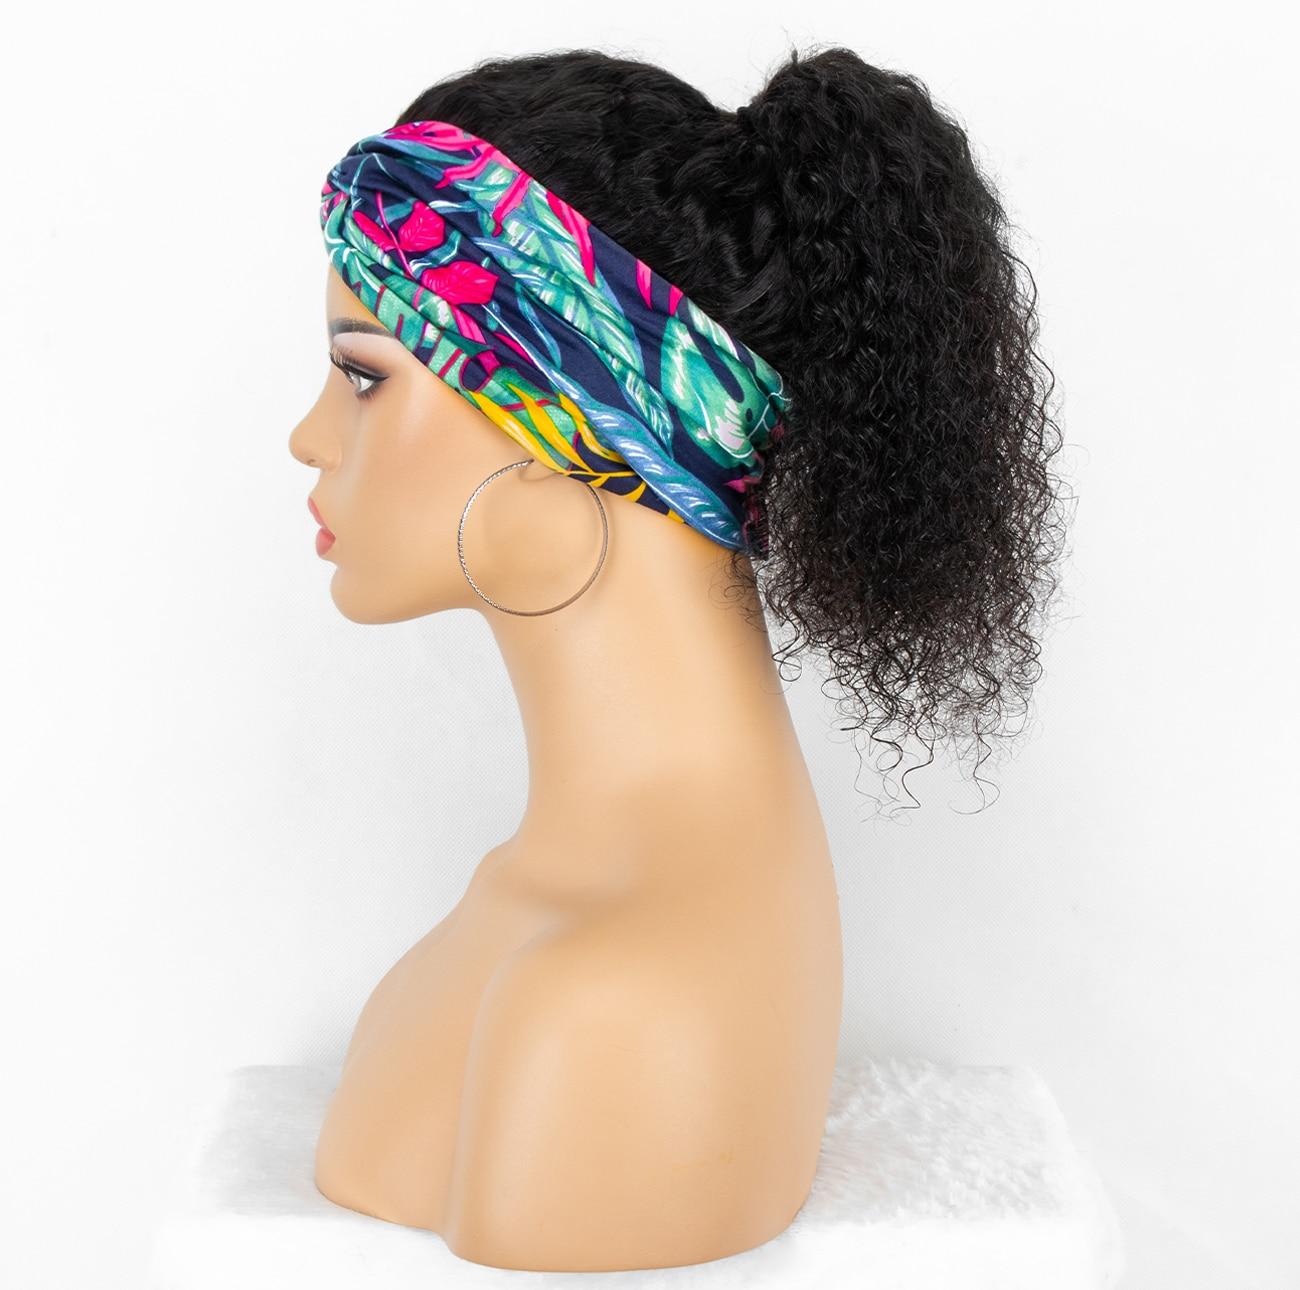 Kinky Curly Head Band Wigs Human Hair Brazilian  Curly Human Hair Wigs Glueless Full Machine Made Wigs  Scarf Headband Wig Remy